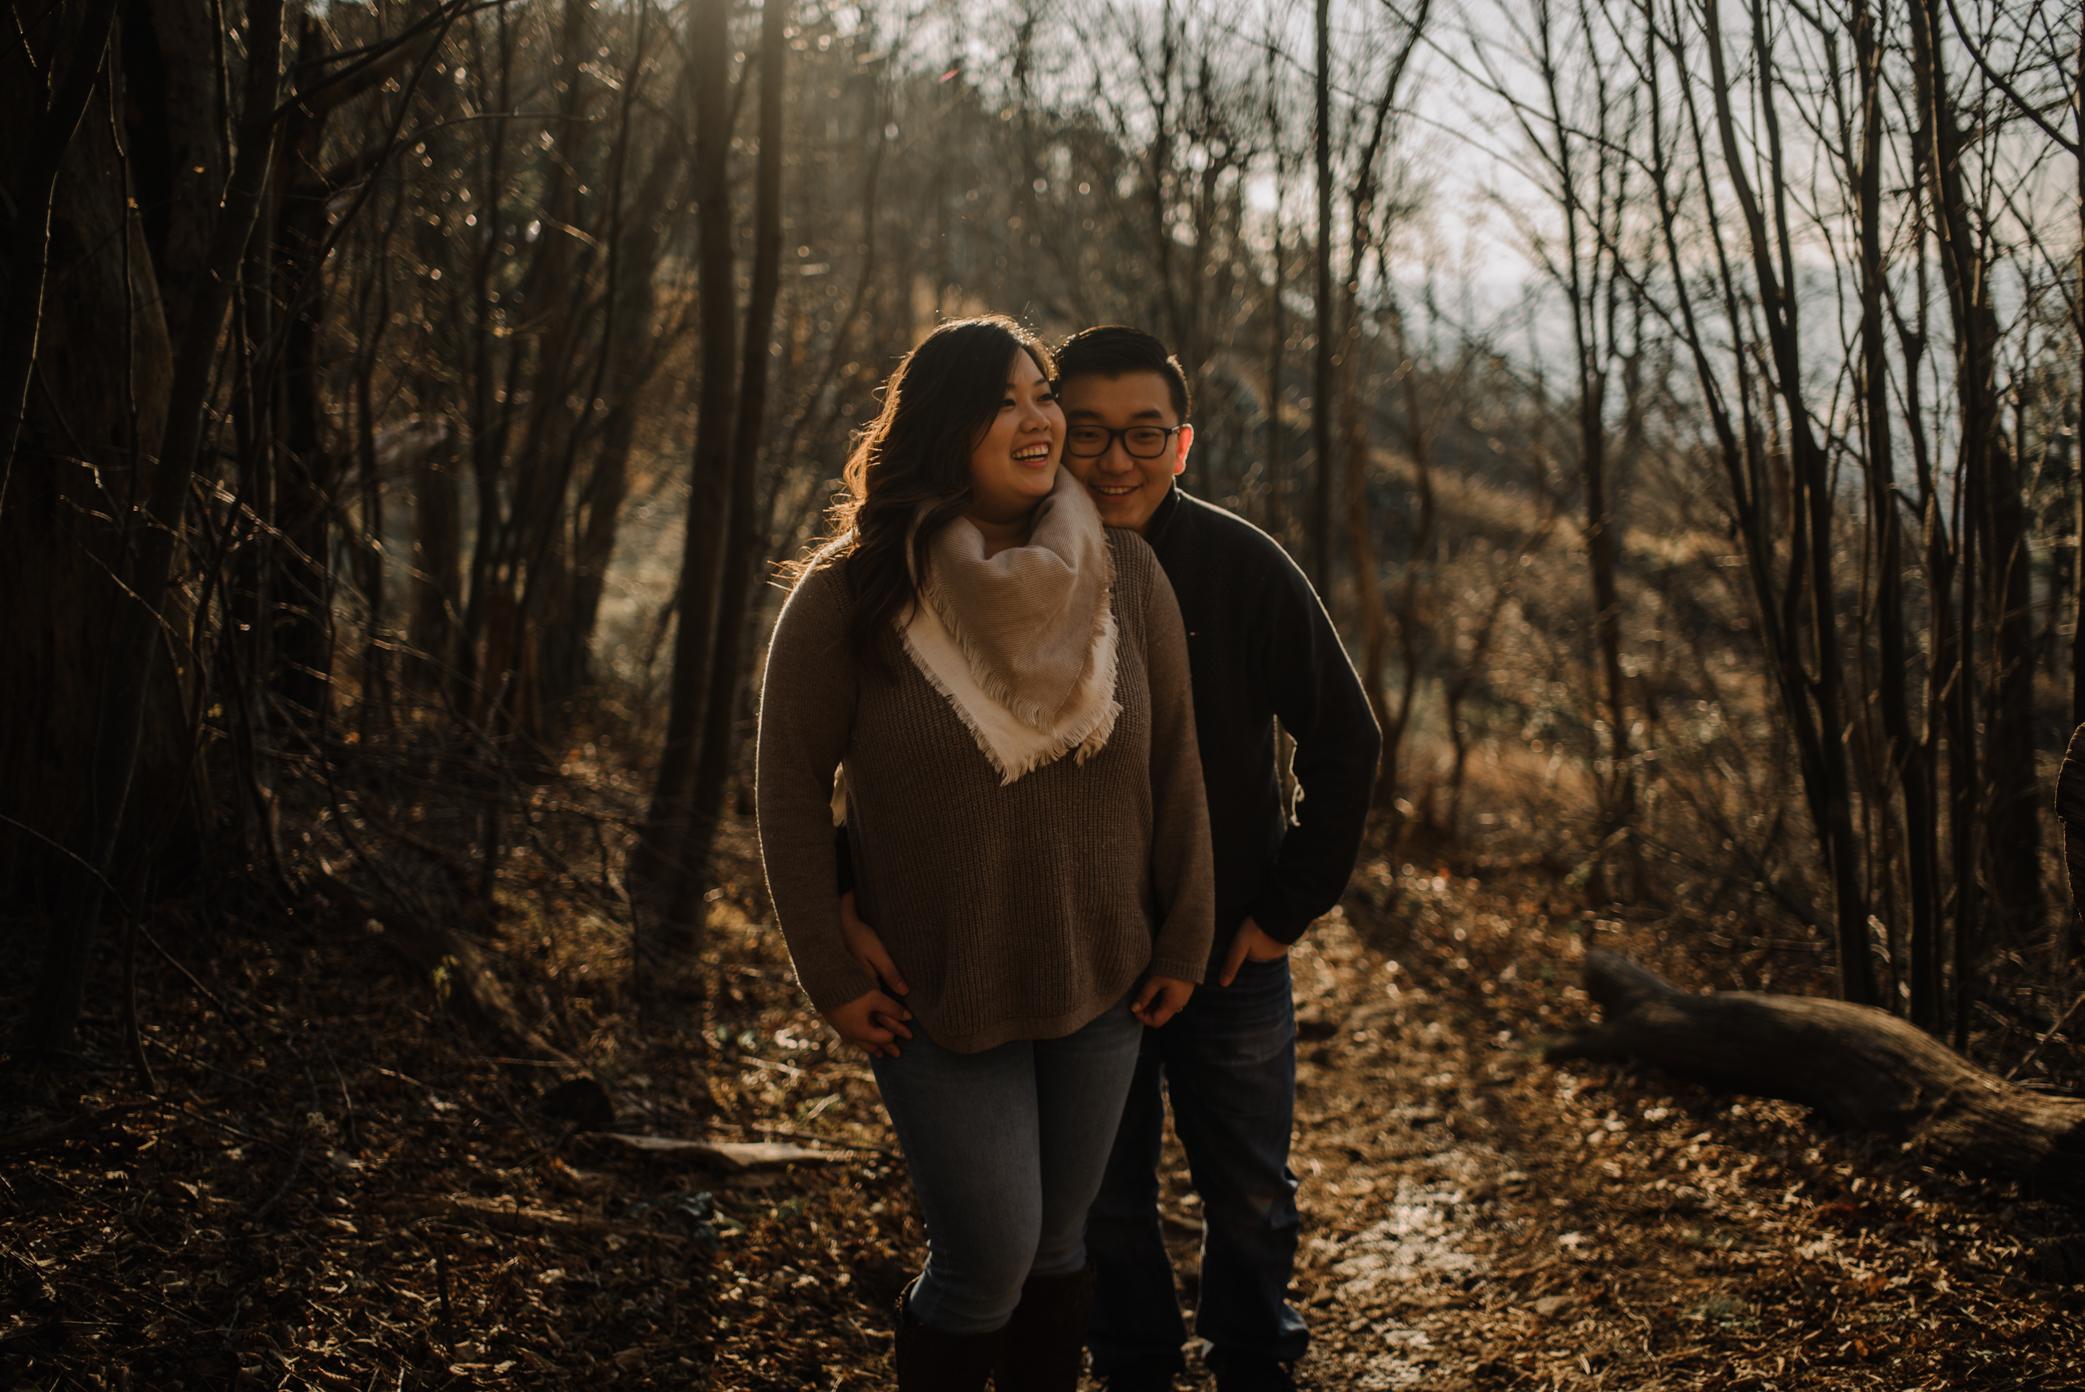 Joshua and Kristina - Shenandoah National Park - Skyline Drive - Winter Engagement Session Photographer - White Sails Creative_6.JPG